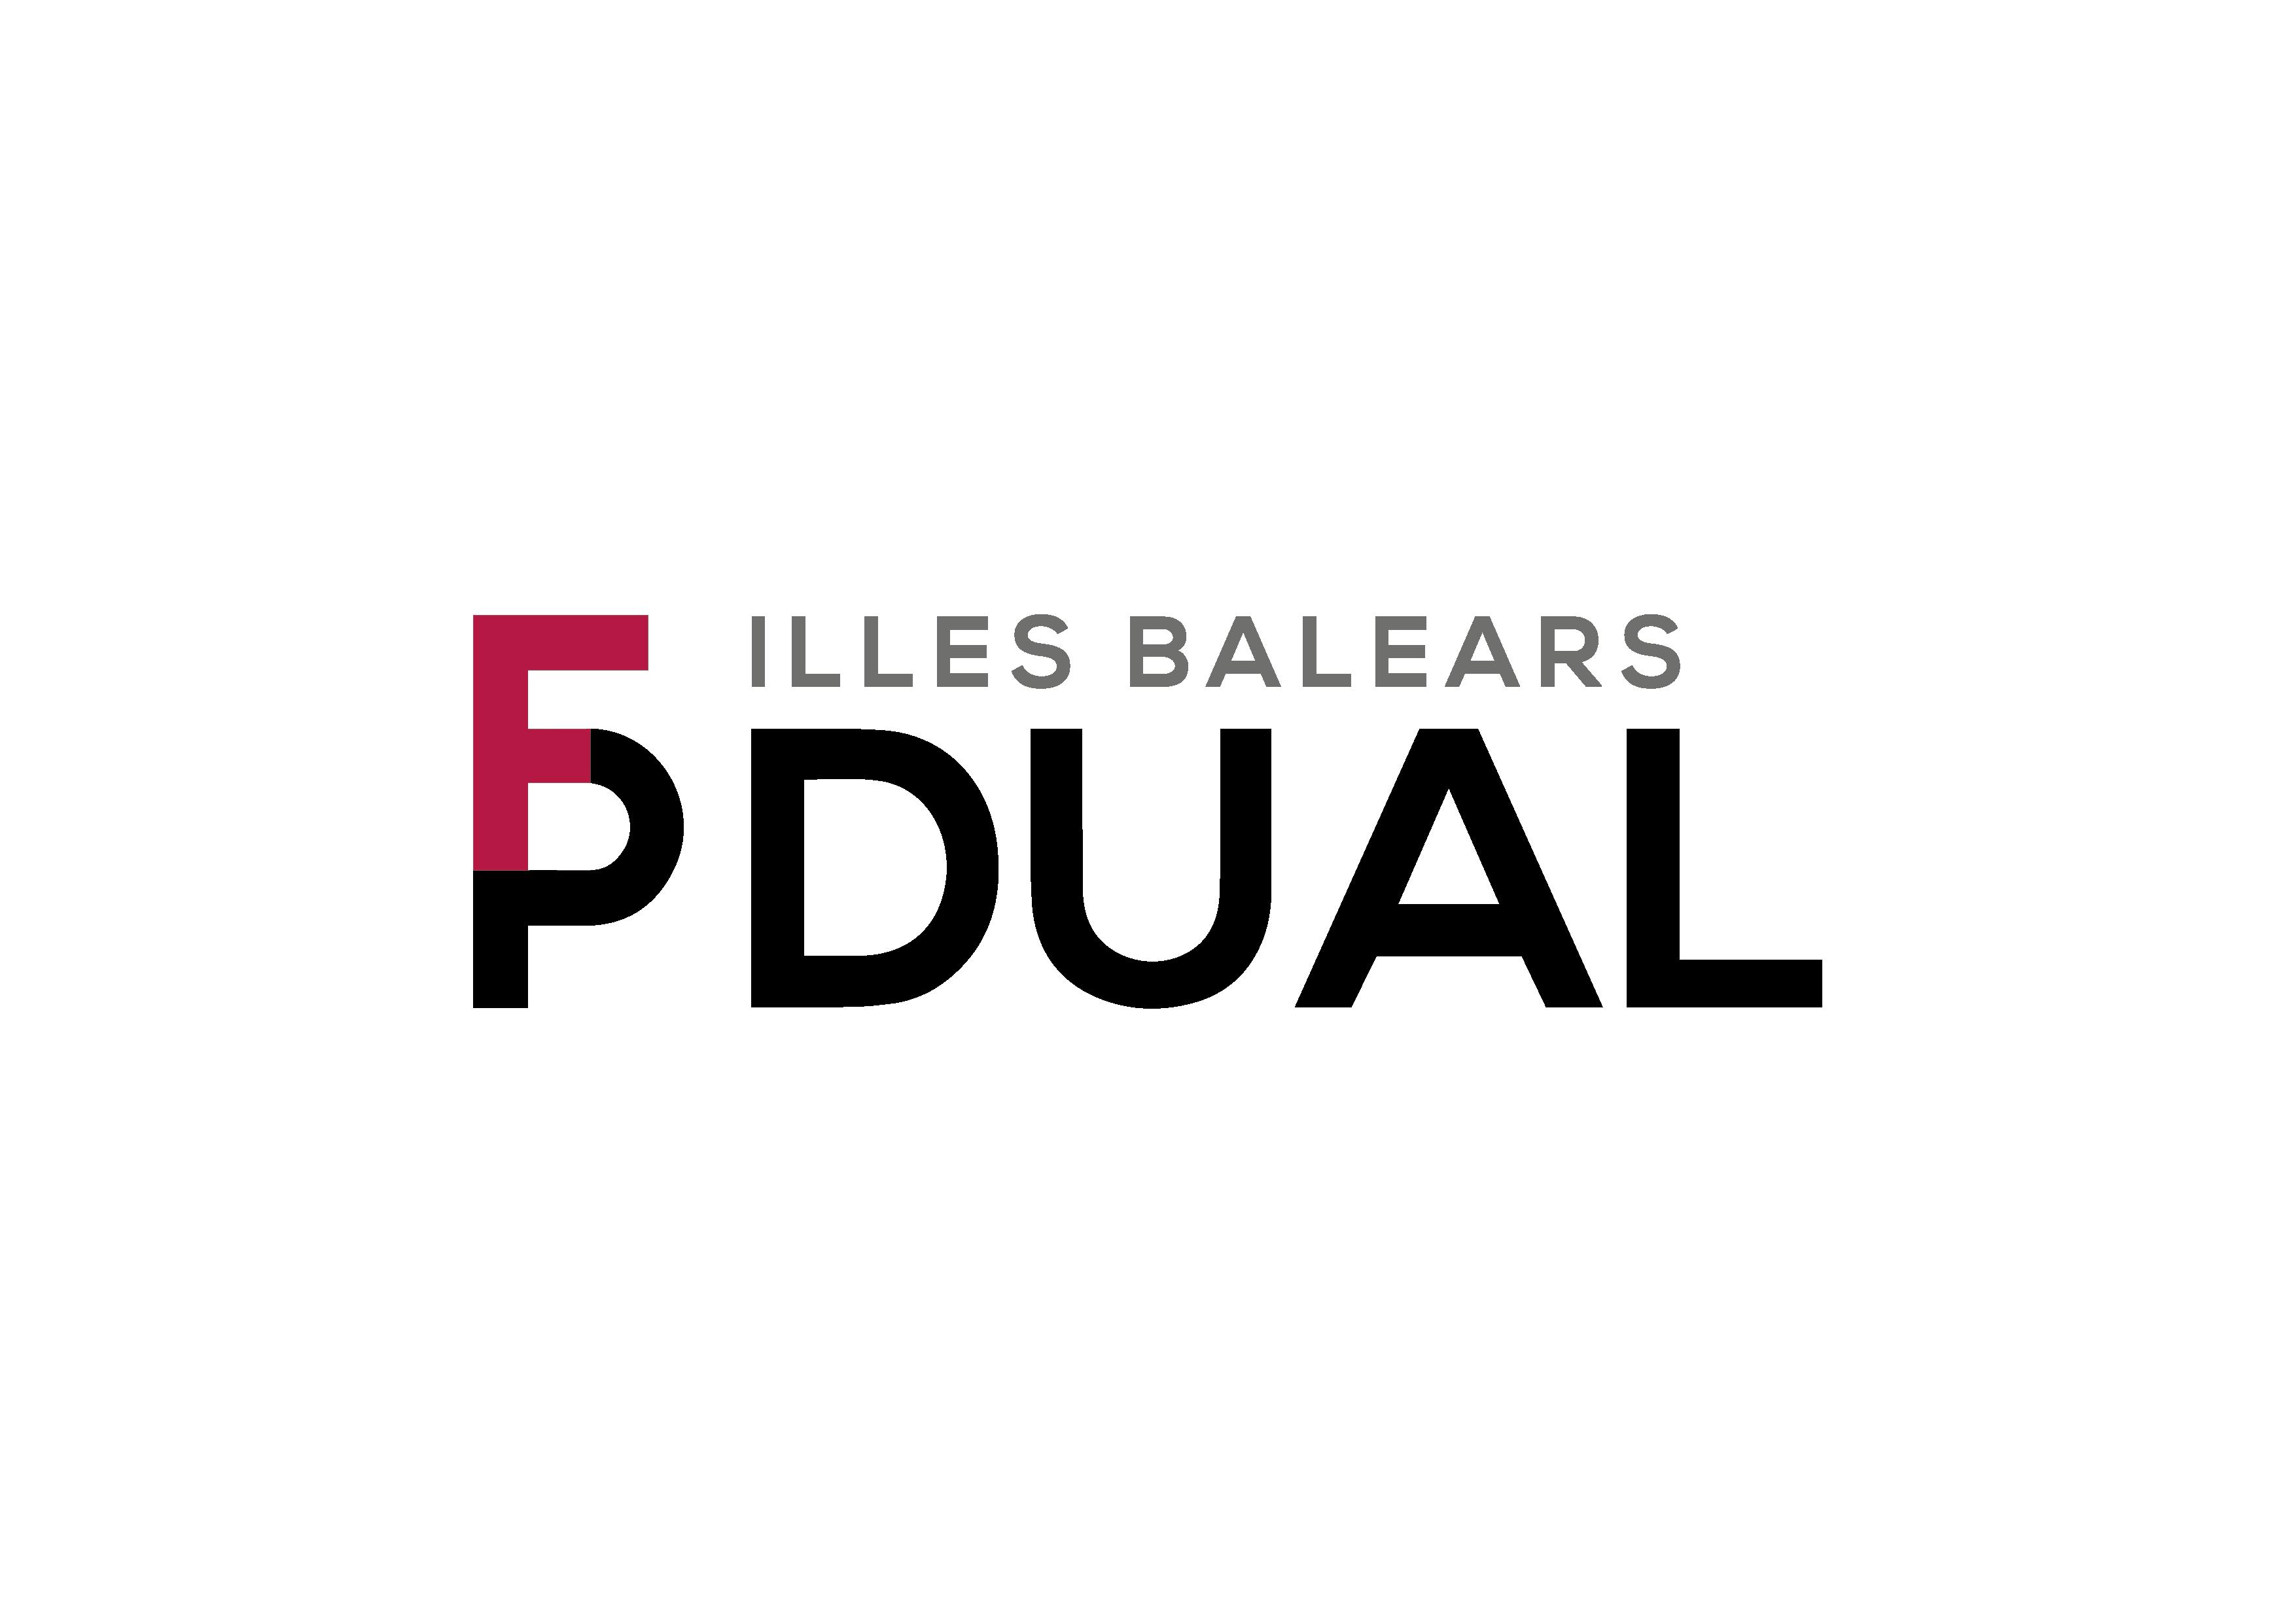 FP Dual Balears